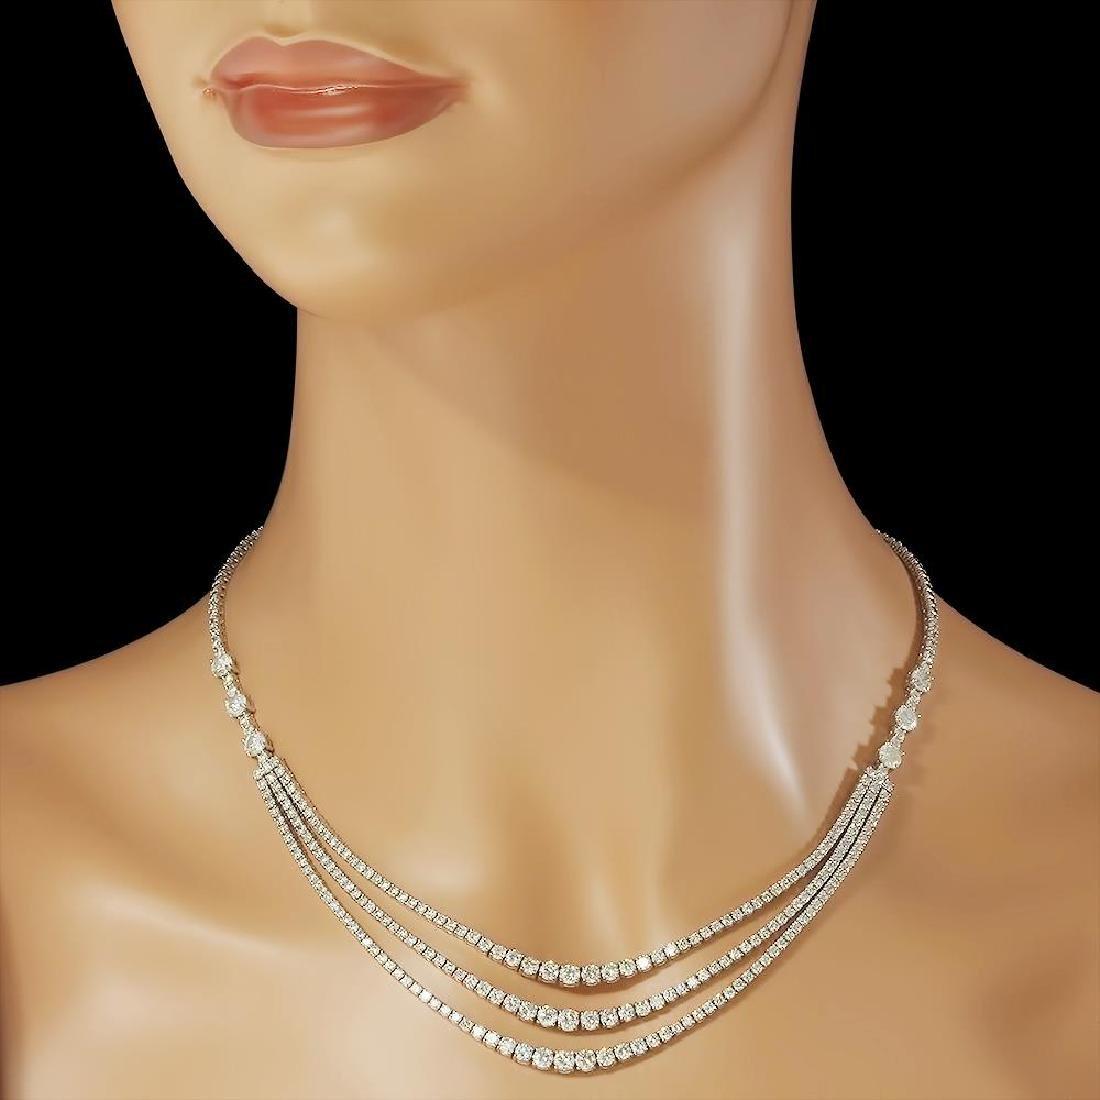 14K Gold 12.20ct Diamond Necklace - 3